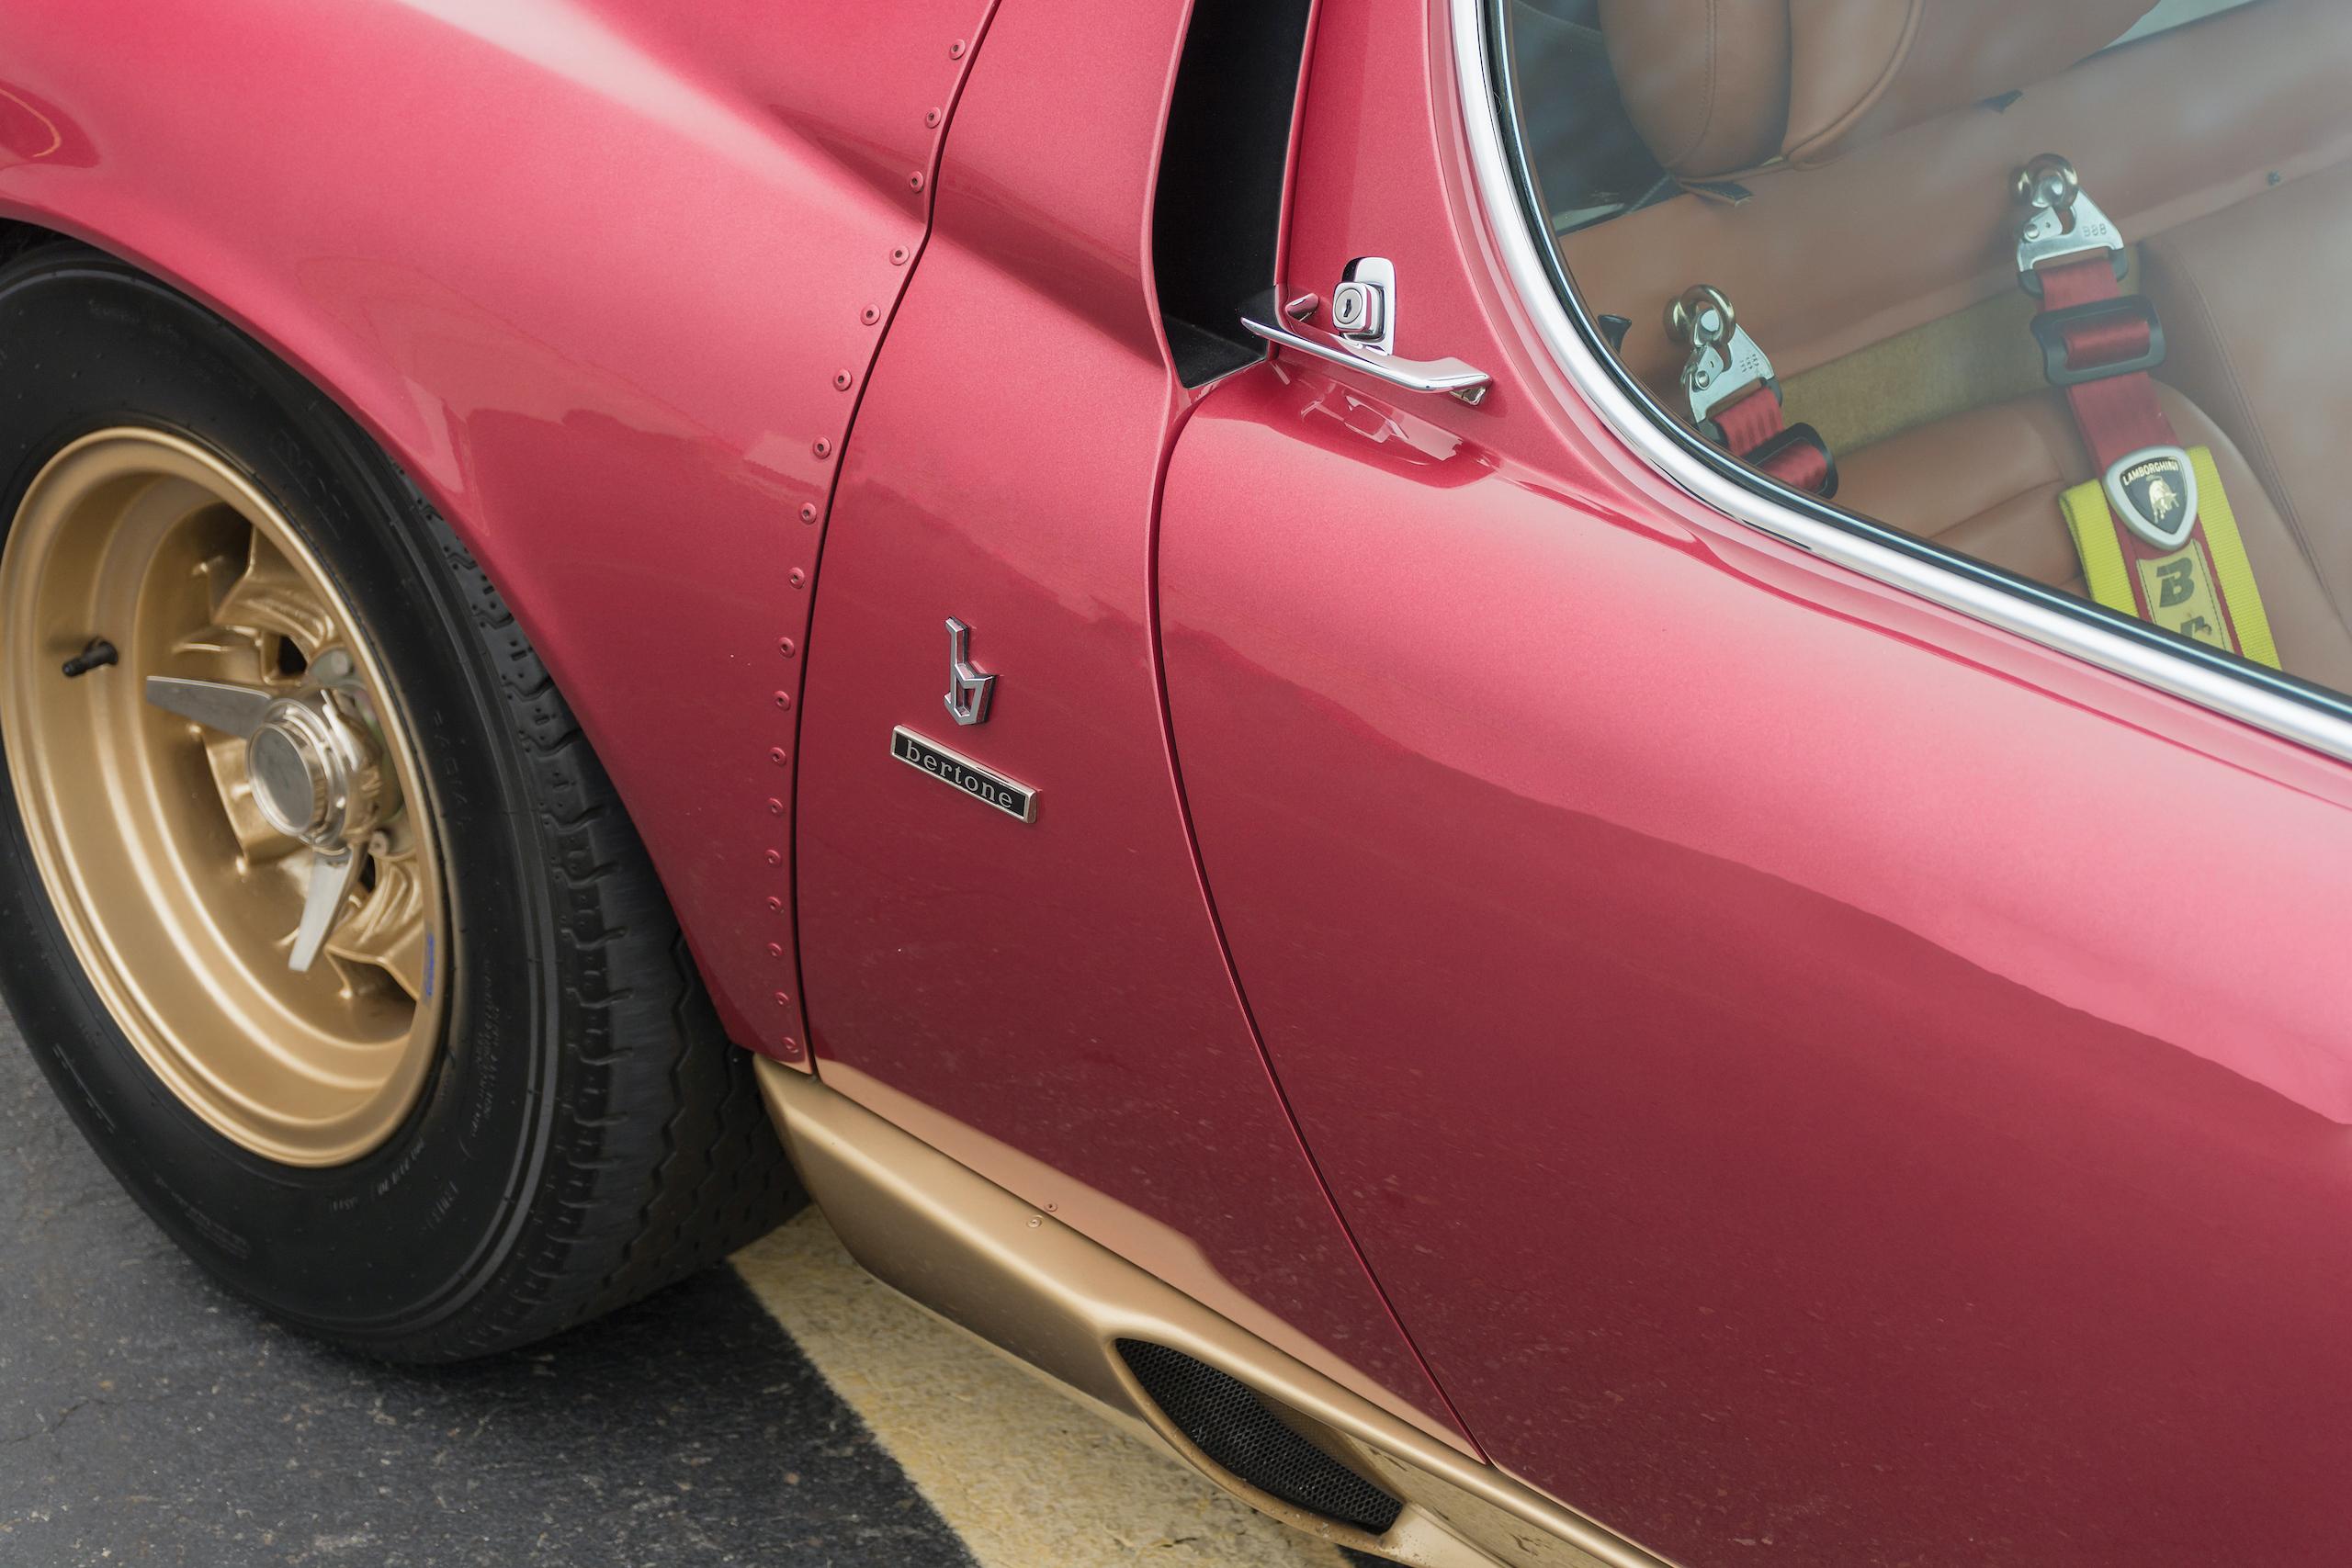 1971 Lamborghini Miura SVJ by Bertone side detail